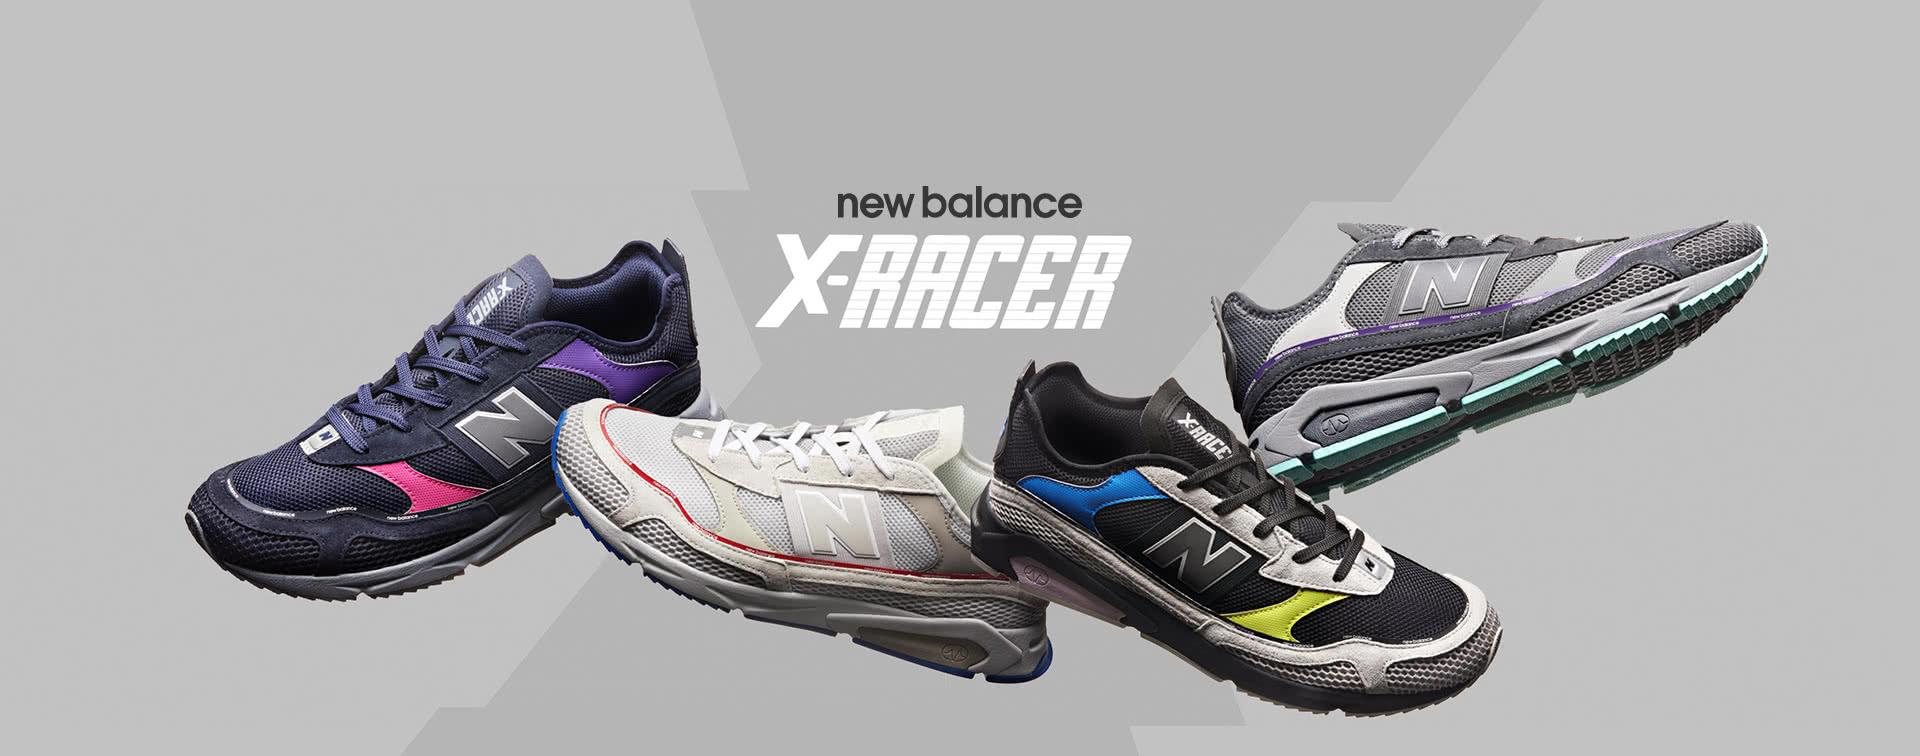 New Balance X Race